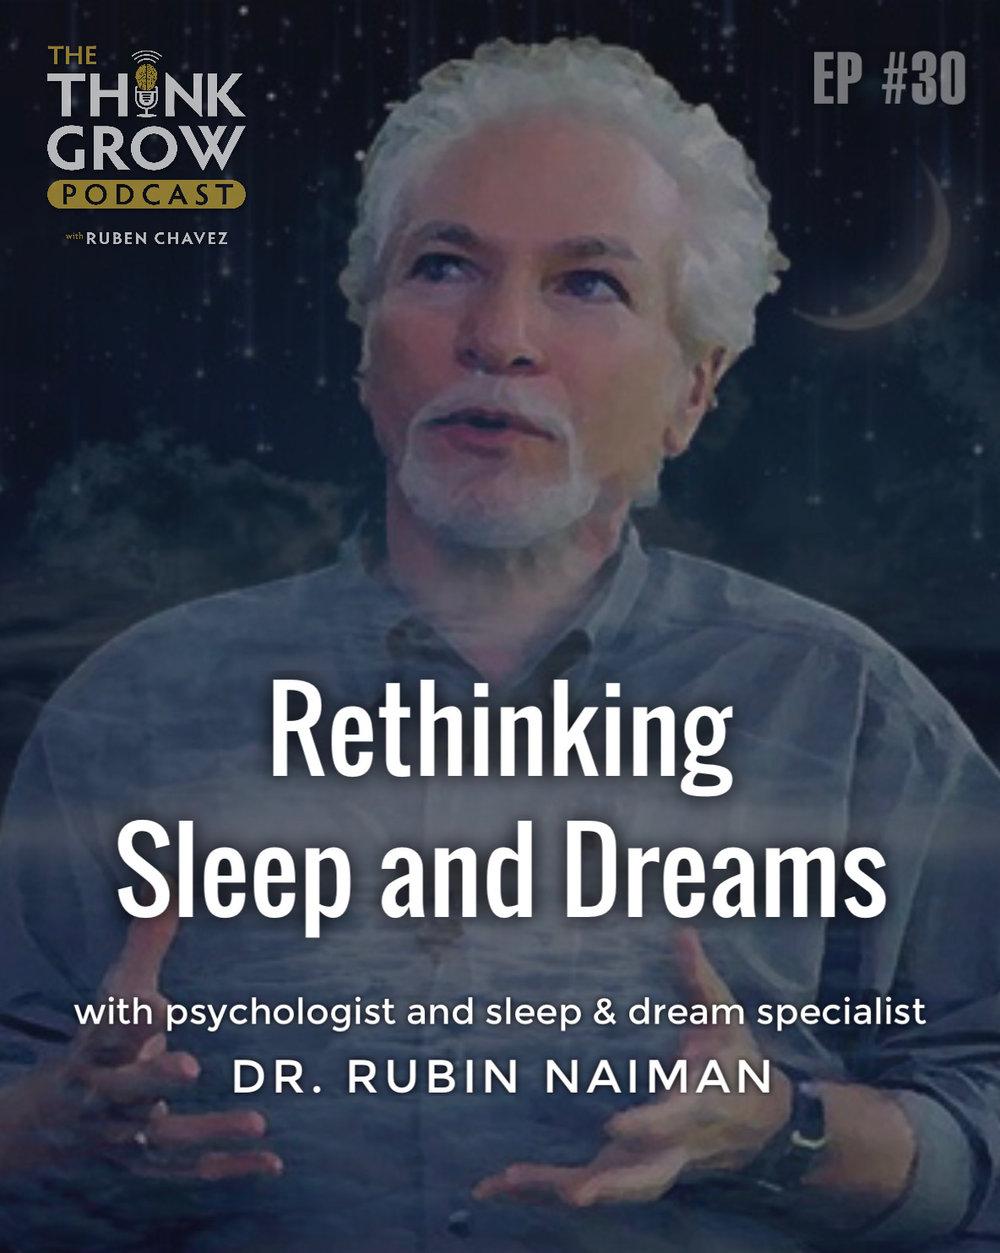 Rethinking Sleep and Dreams with Dr. Rubin Naiman